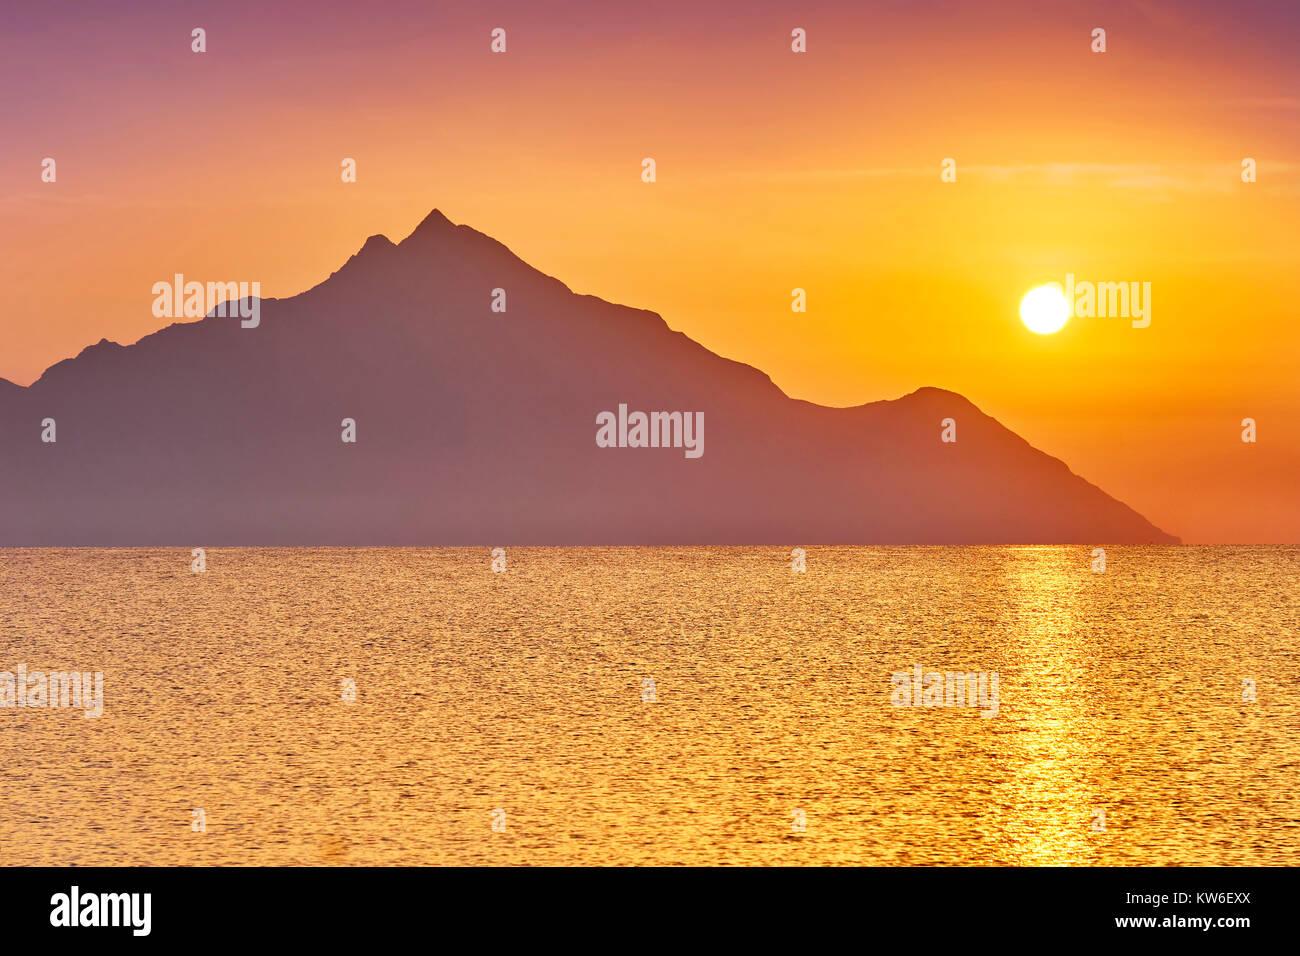 Sunrise over Mount Athos, Halkidiki or Chalkidiki, Greece - Stock Image